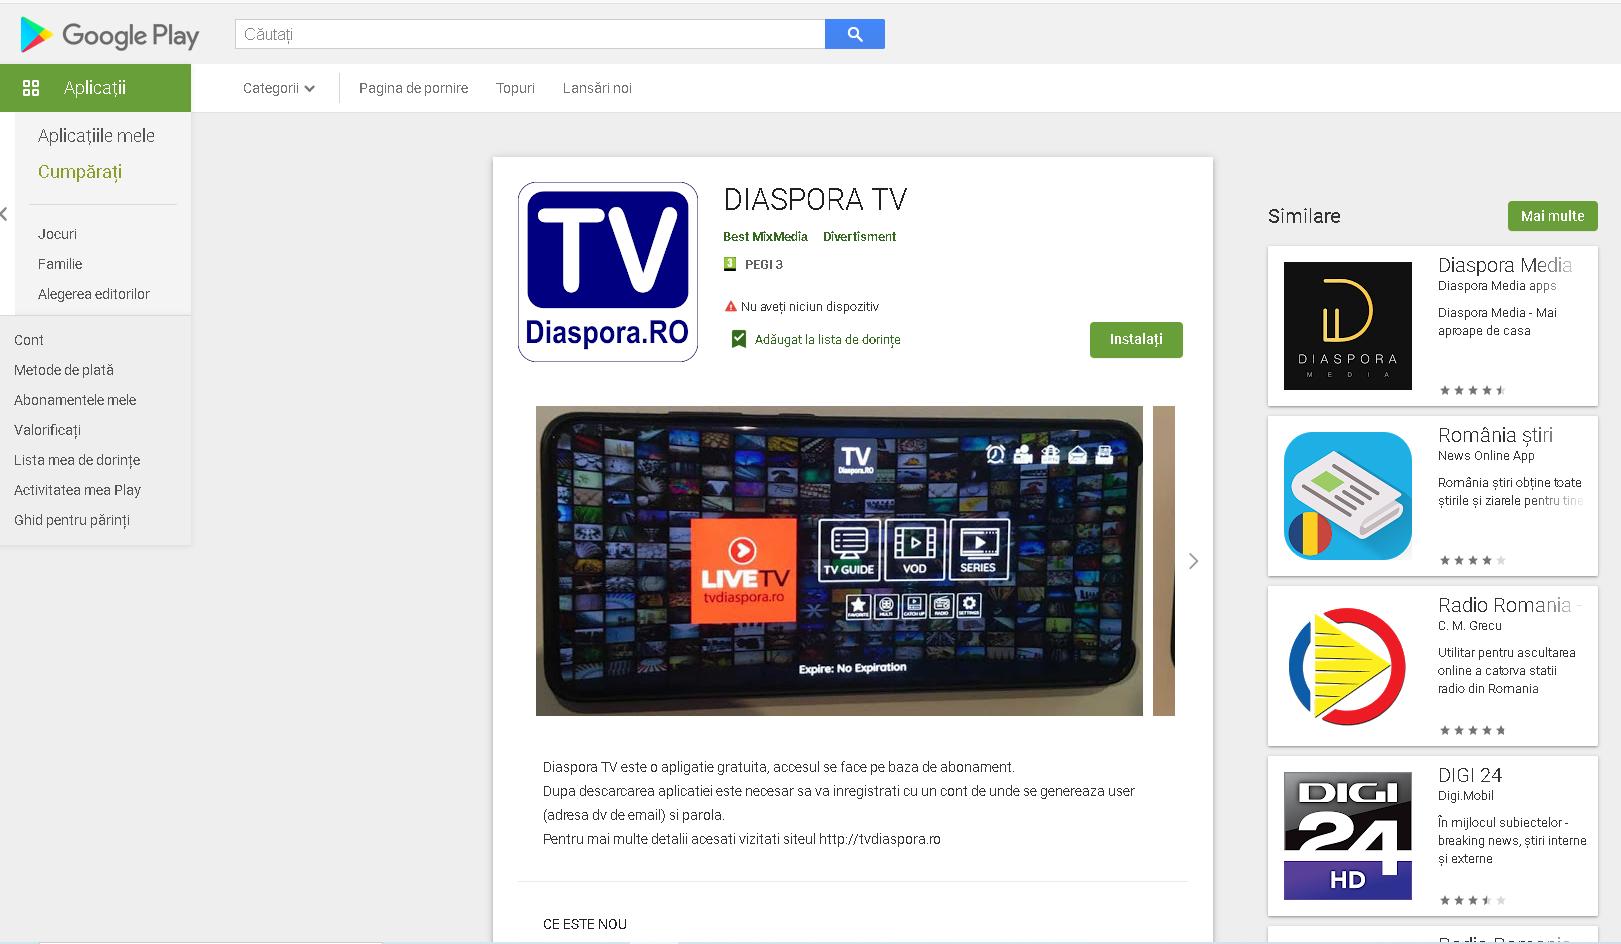 diaspora-tv-google-play